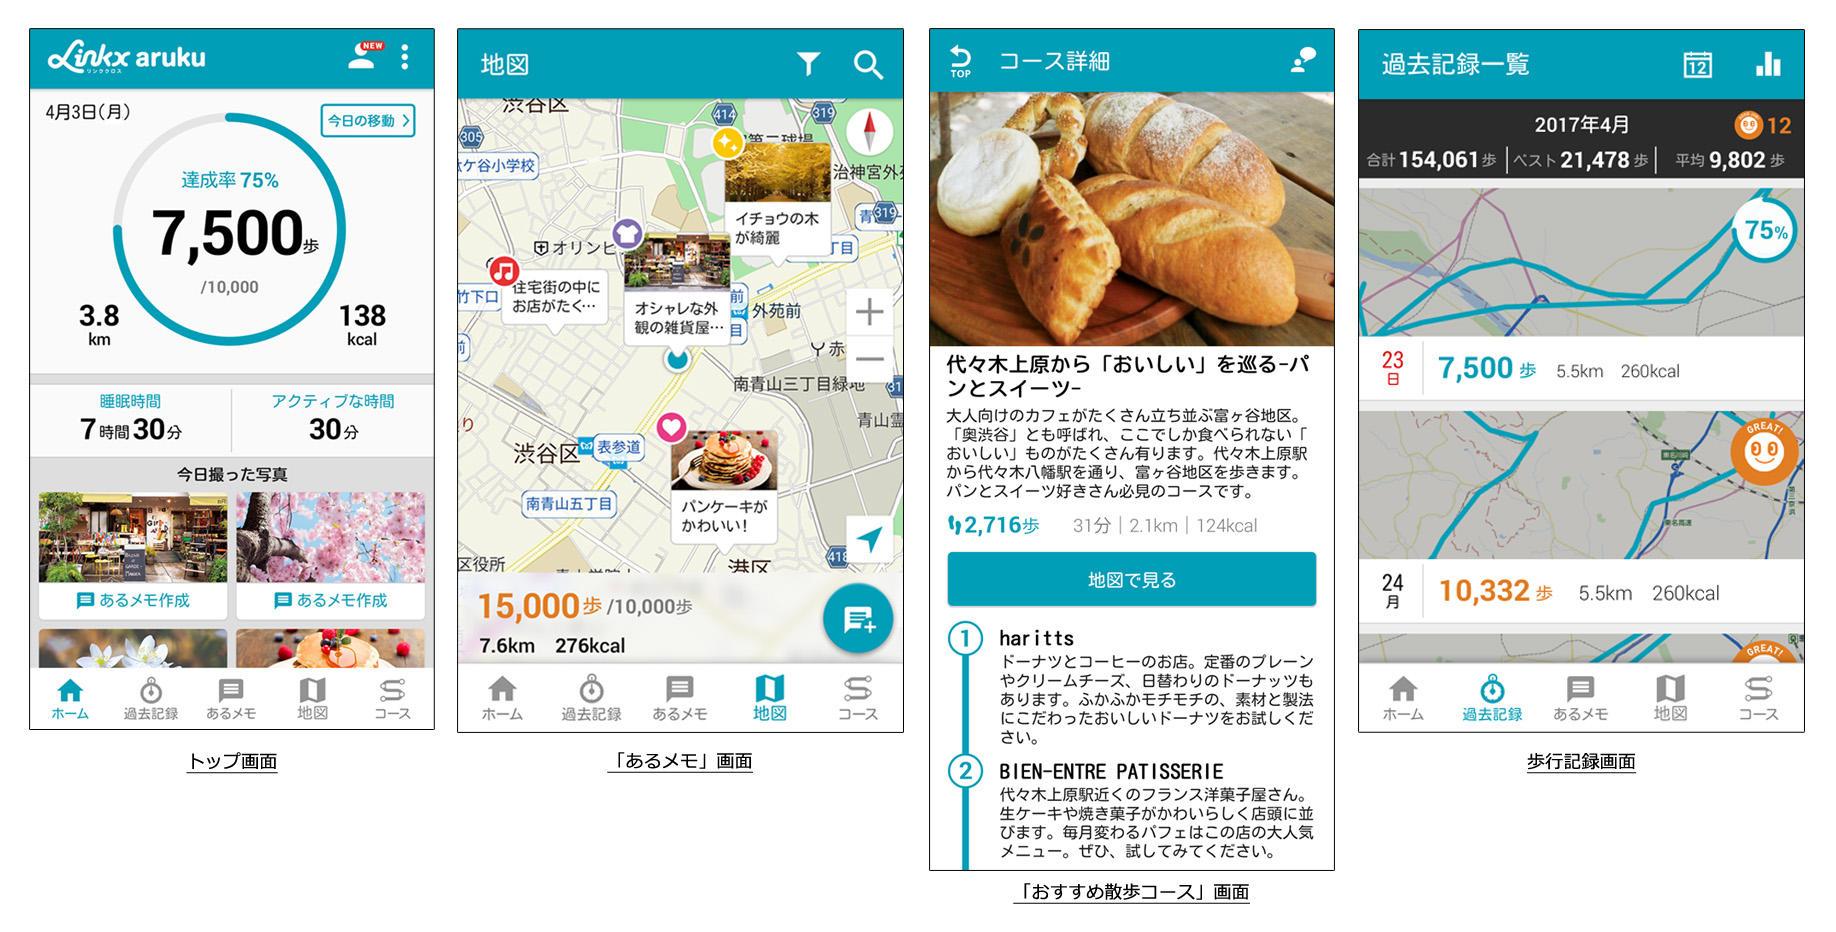 http://corporate.navitime.co.jp/topics/0403_linkx%20aruku.jpg